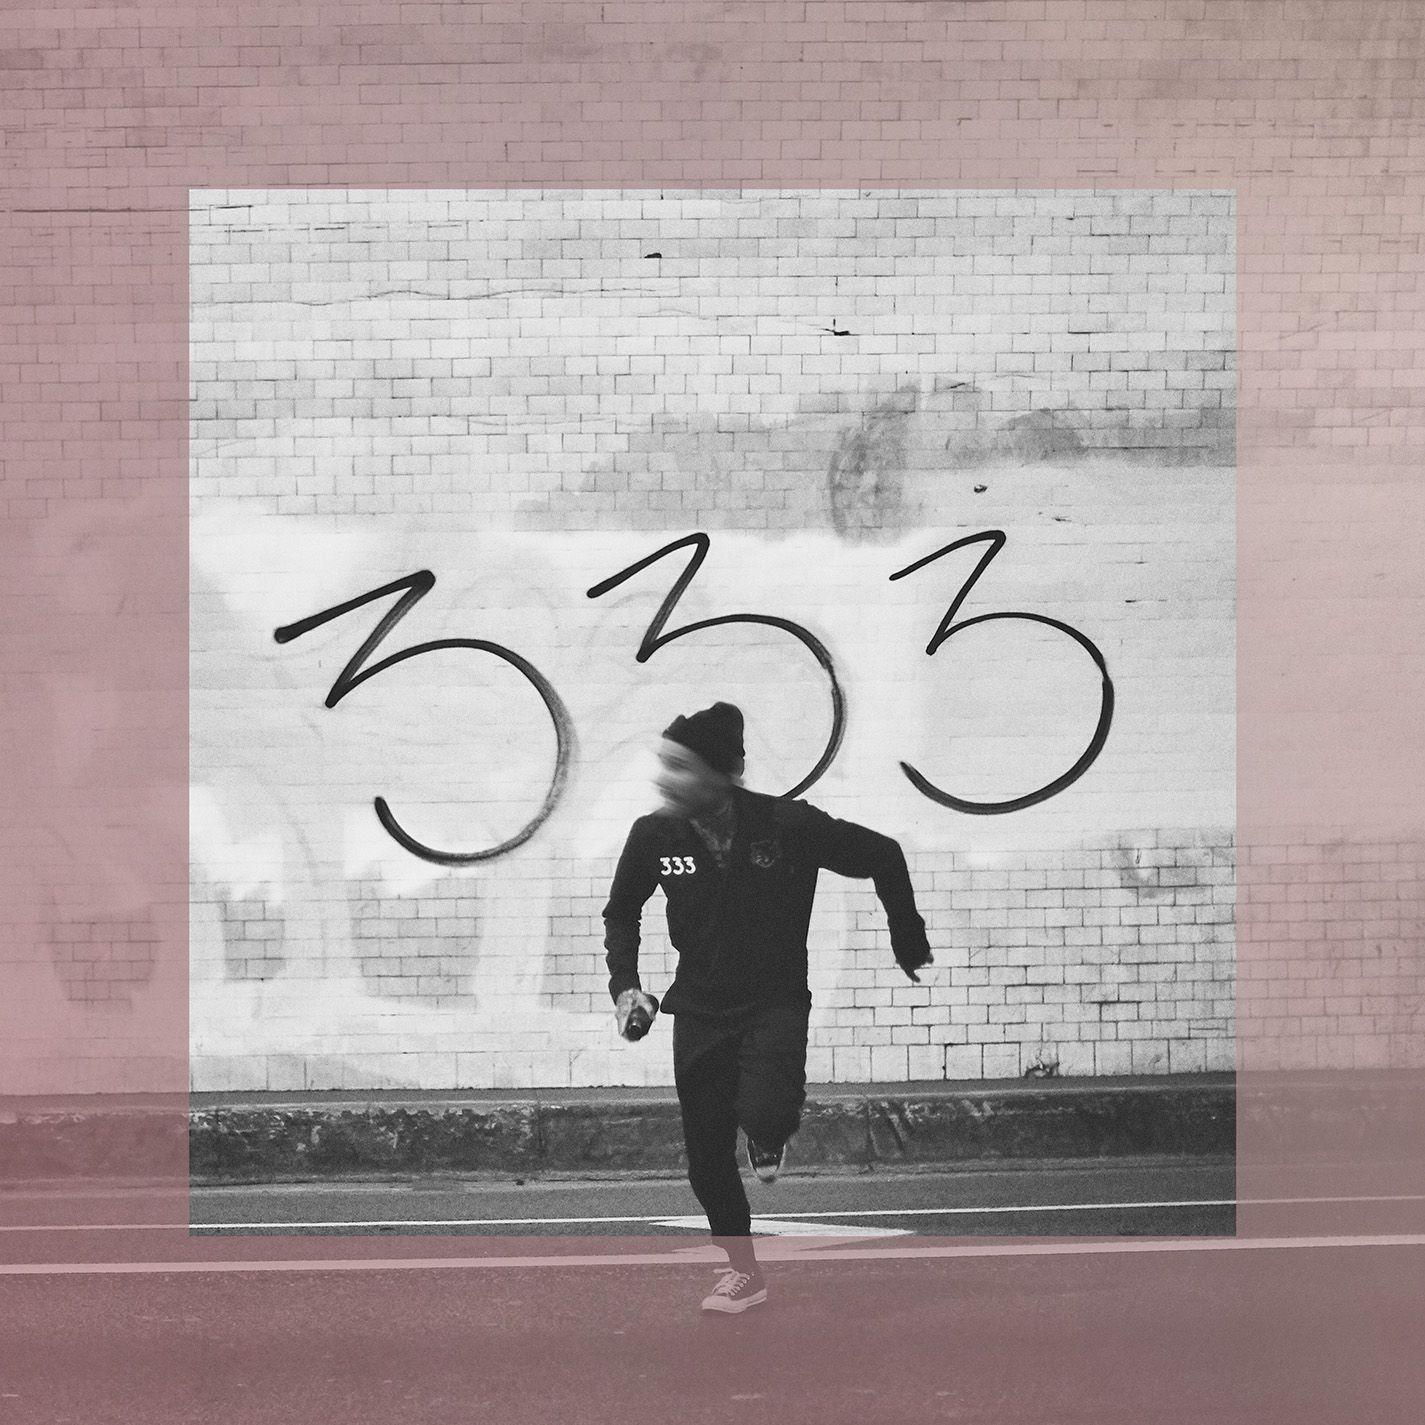 strength-in-numb333rs-album-art.jpg